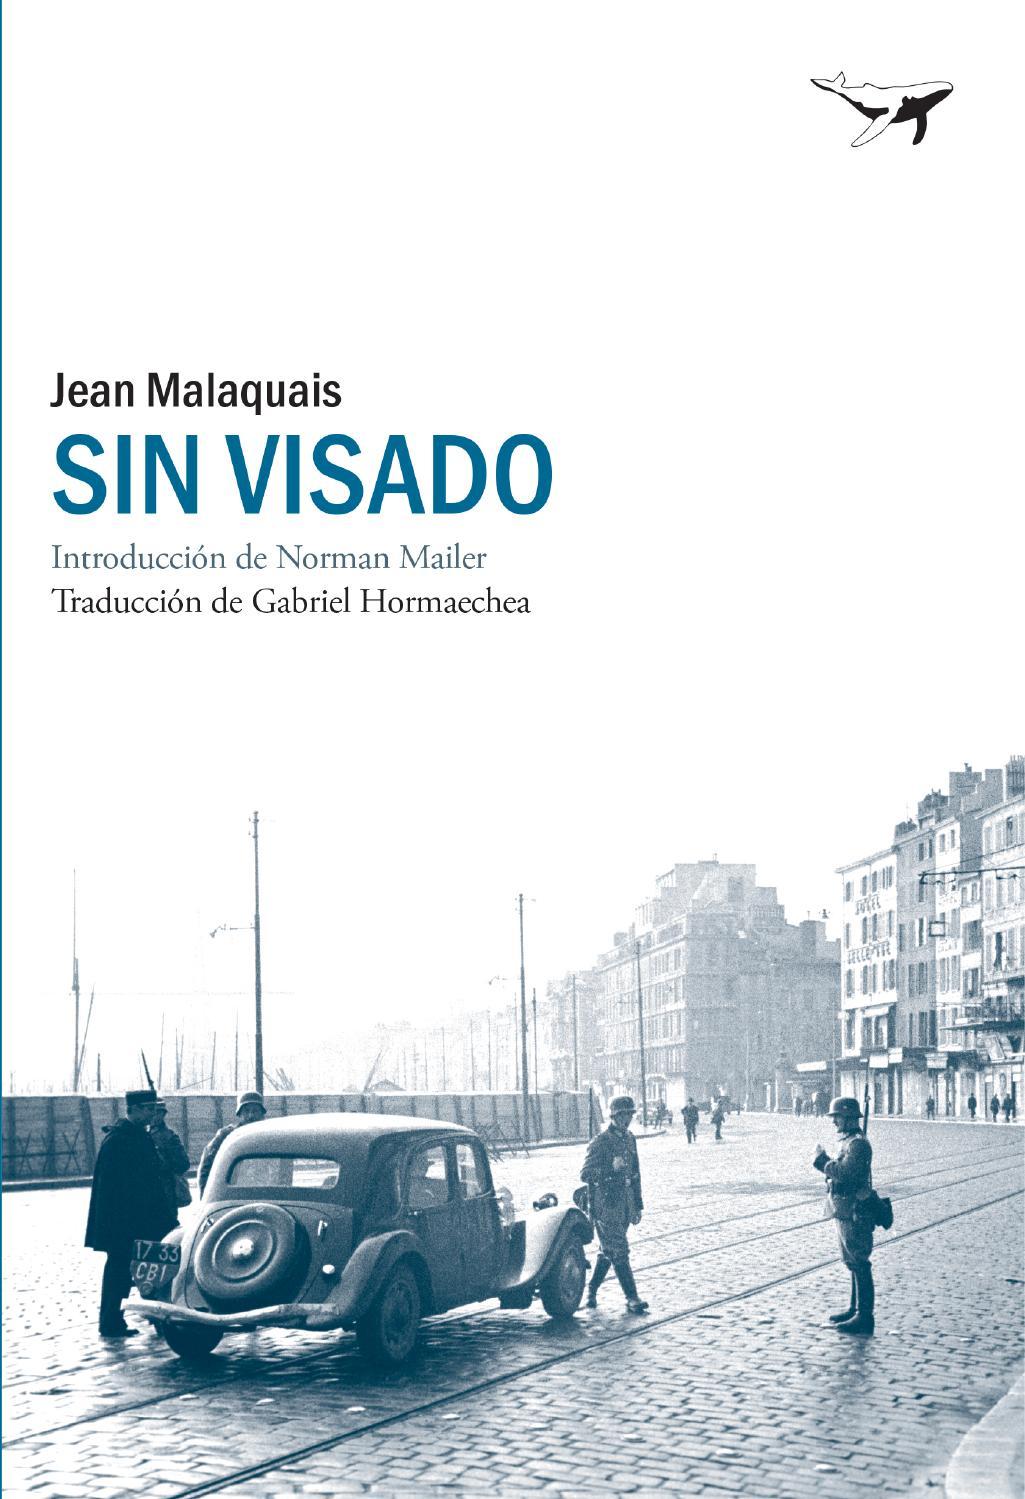 SIN VISADO (Jean Malaquais) by Sajalin Editores - issuu